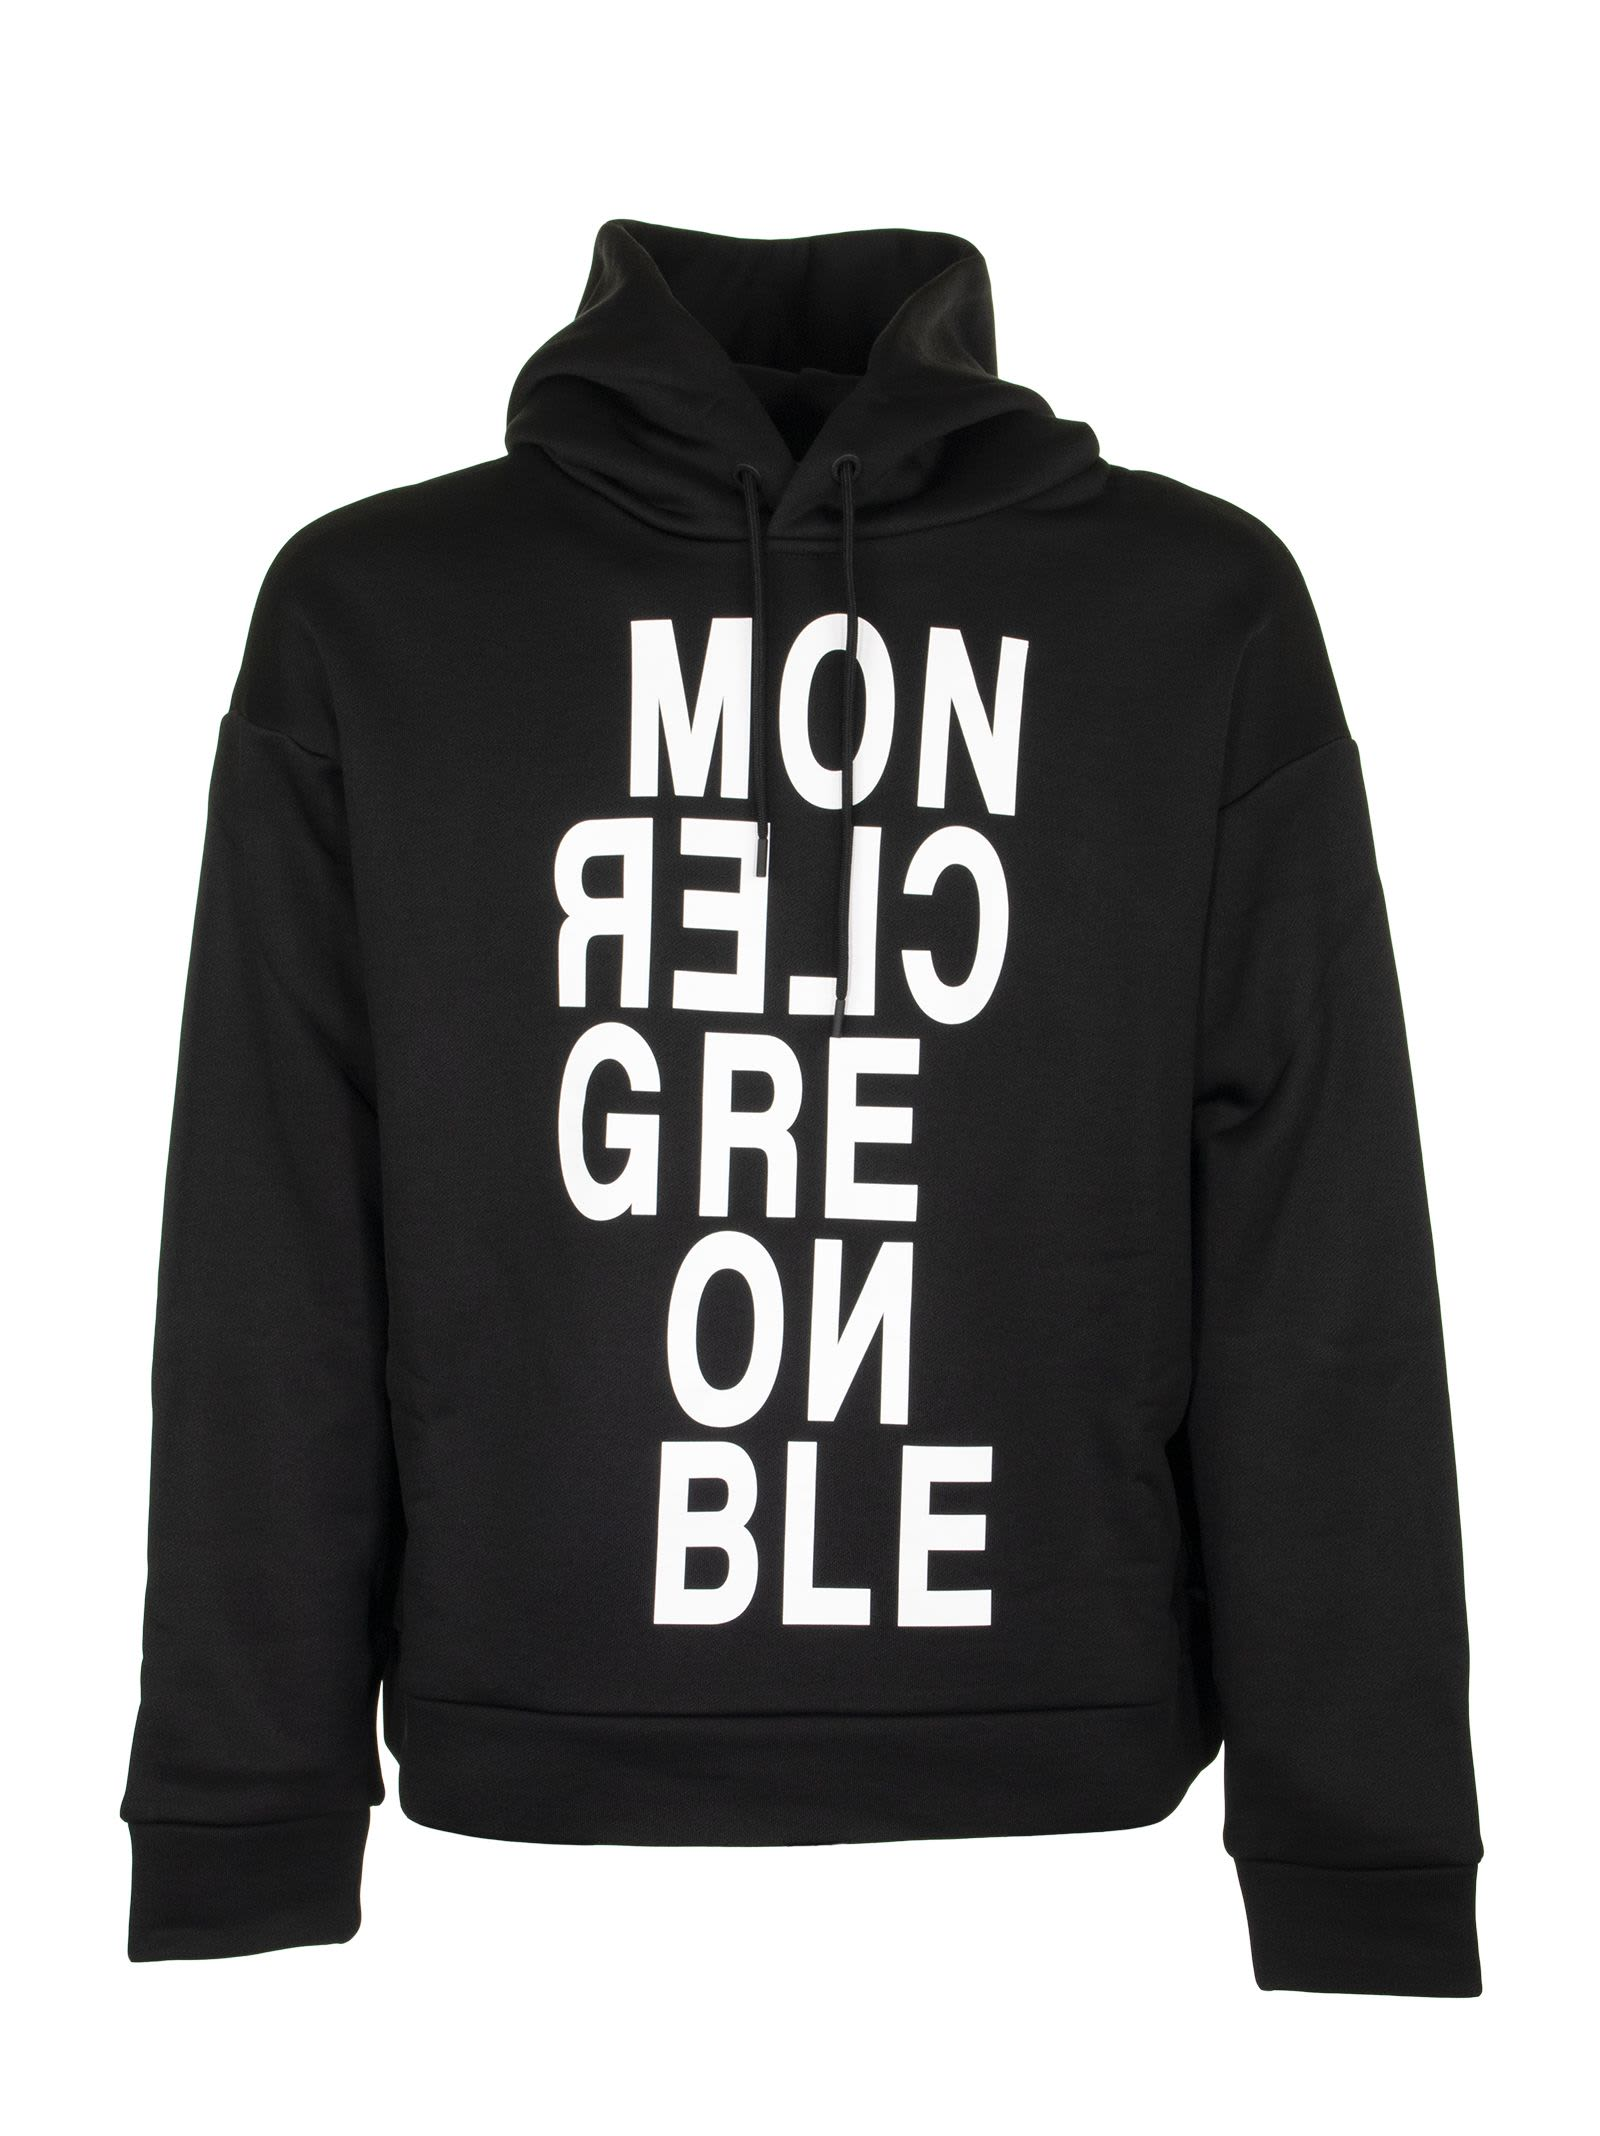 Moncler Grenoble Sweatshirt Black Sweater